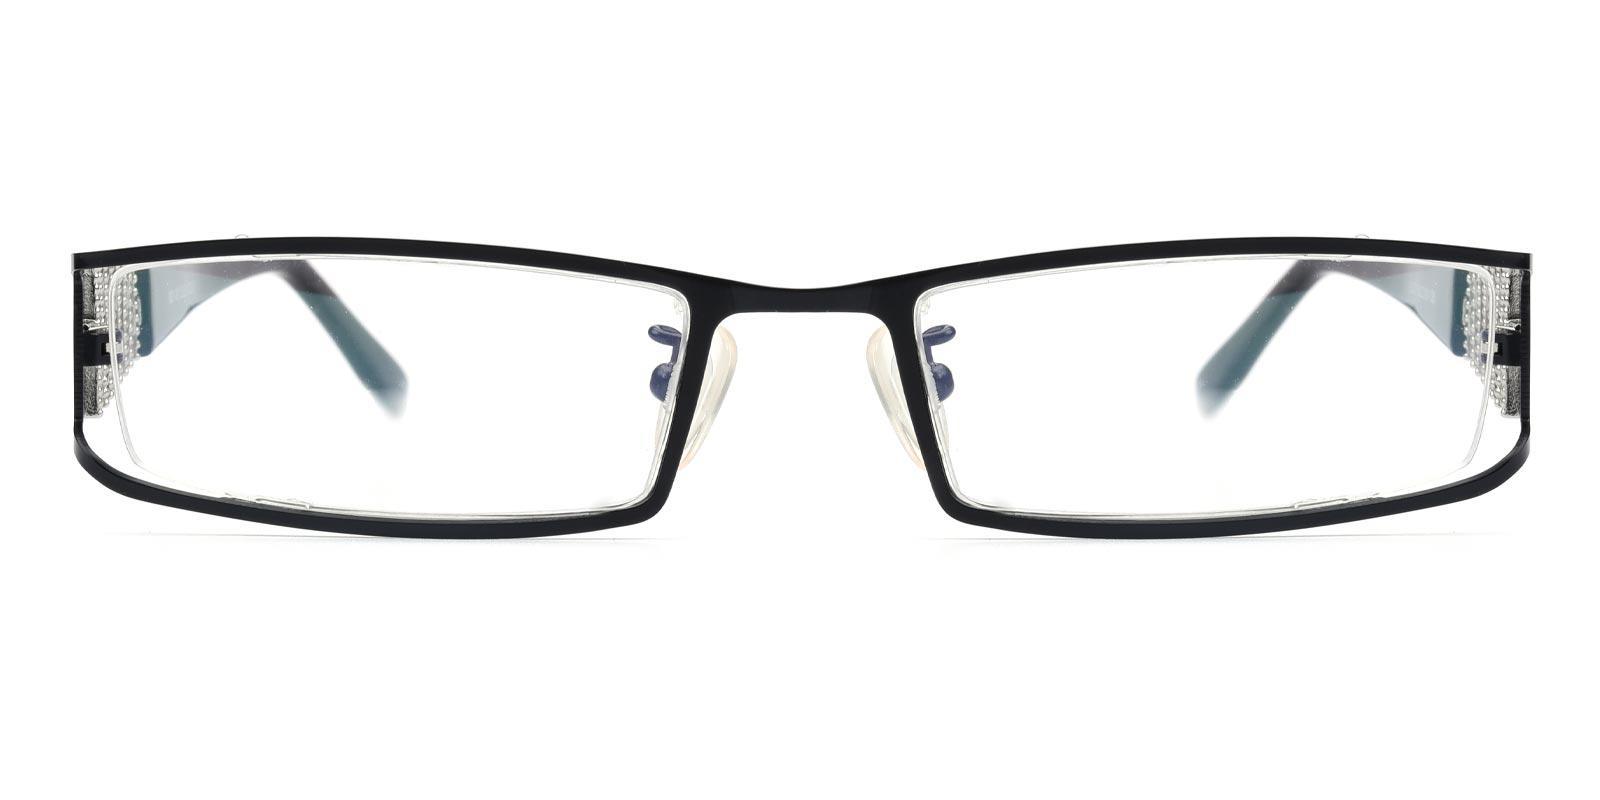 Akili-Black-Rectangle-Metal-Eyeglasses-additional2